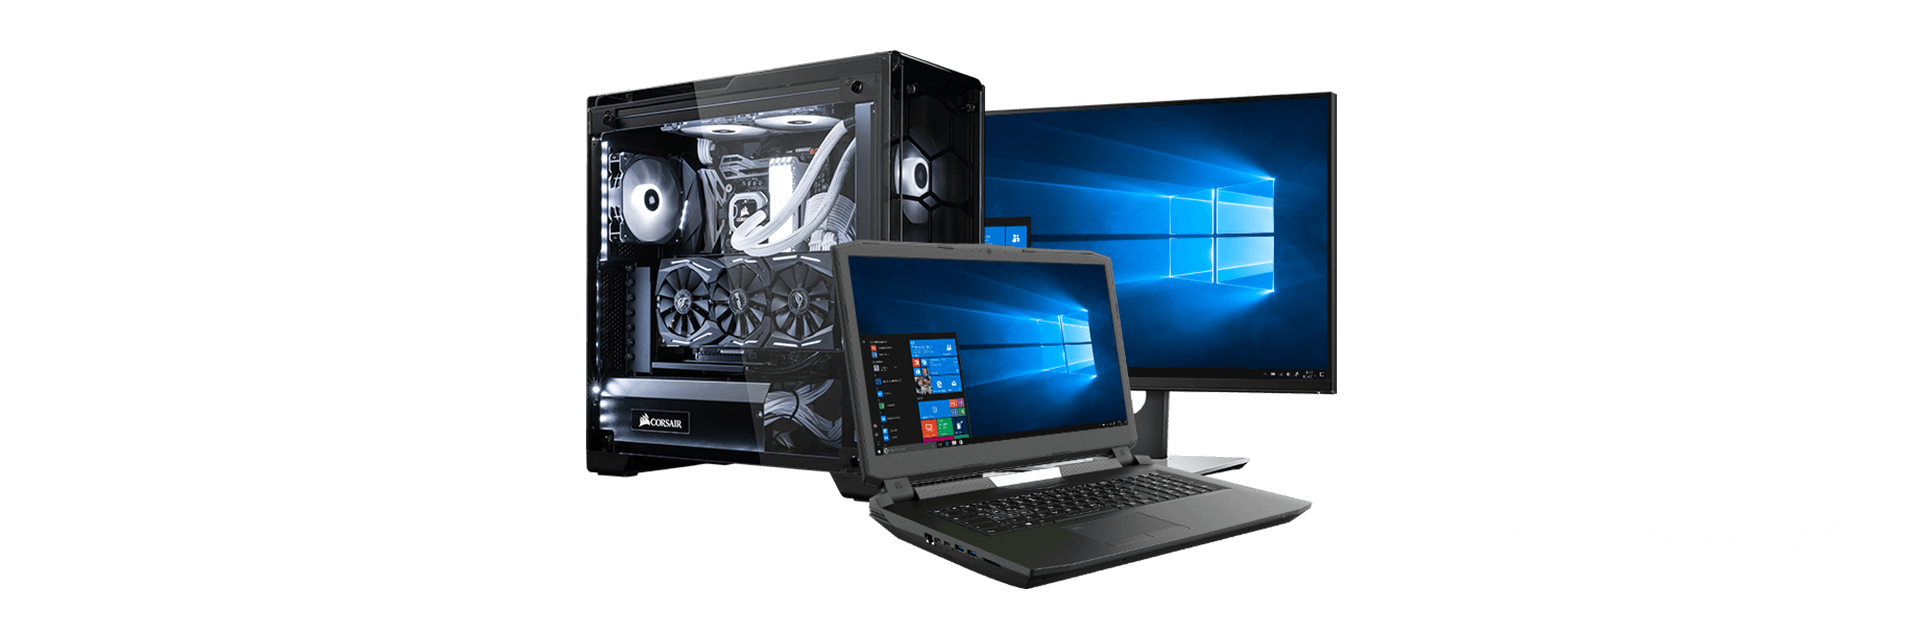 Windows 10 Laptop Desktop PC